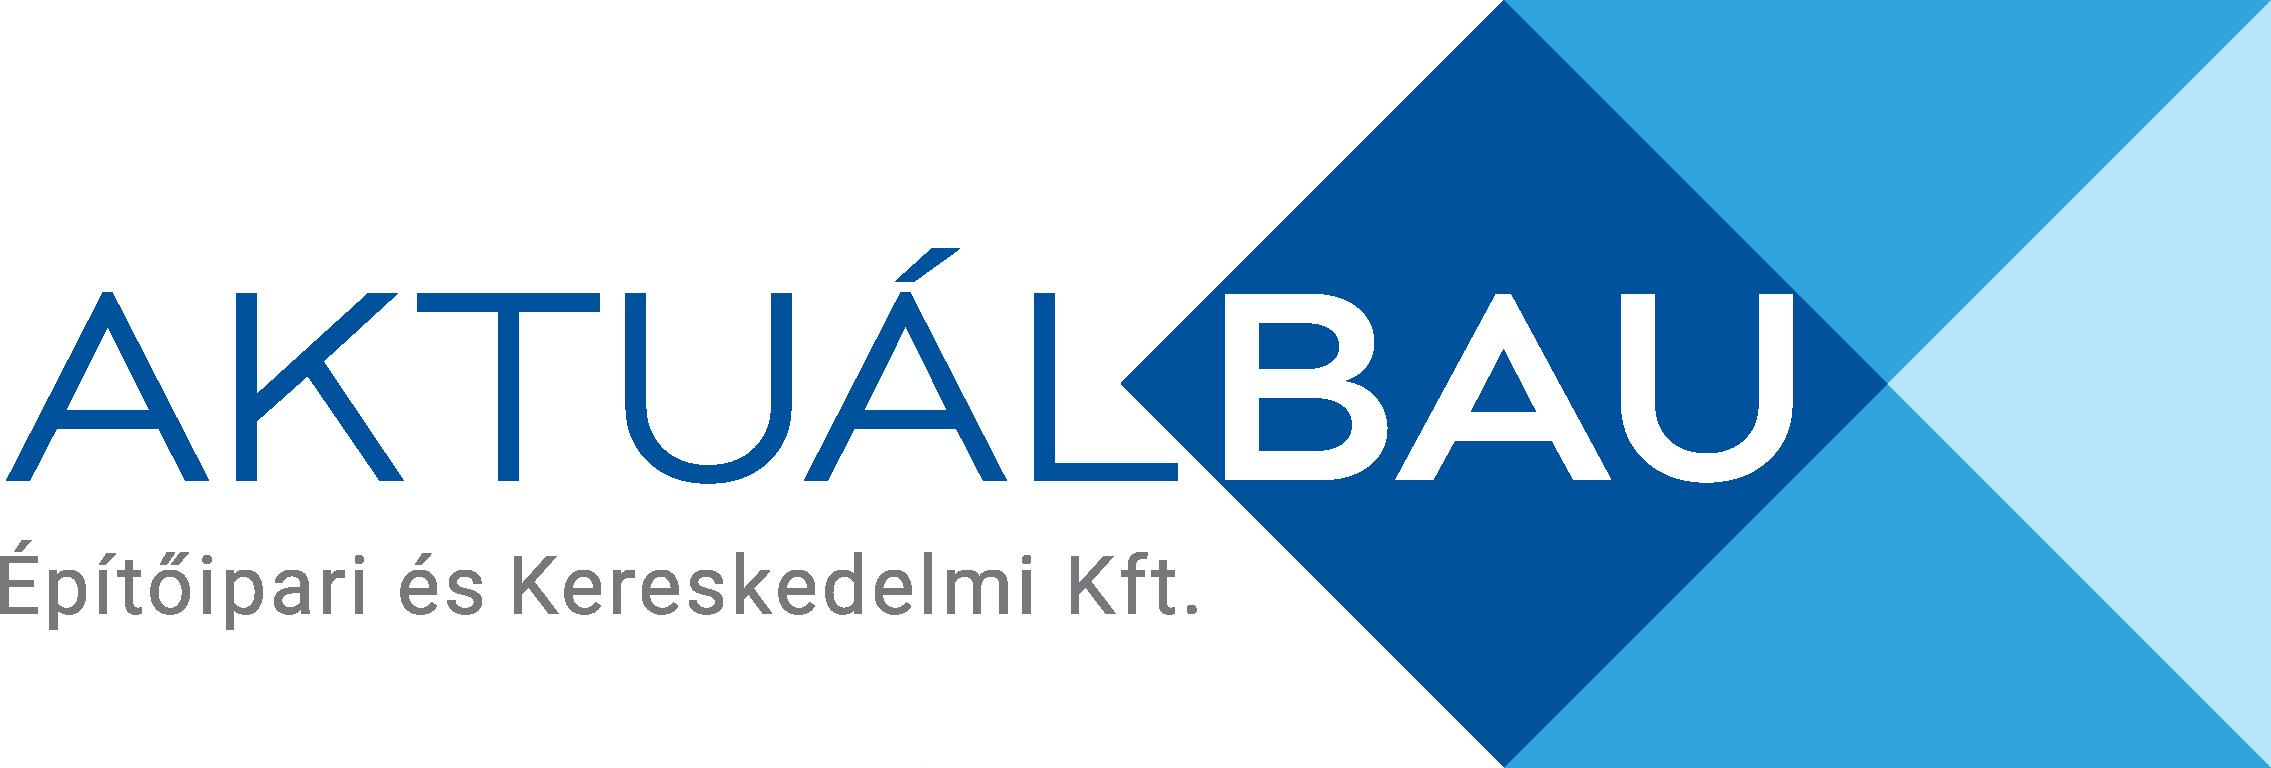 AKTUÁL BAU Kft.